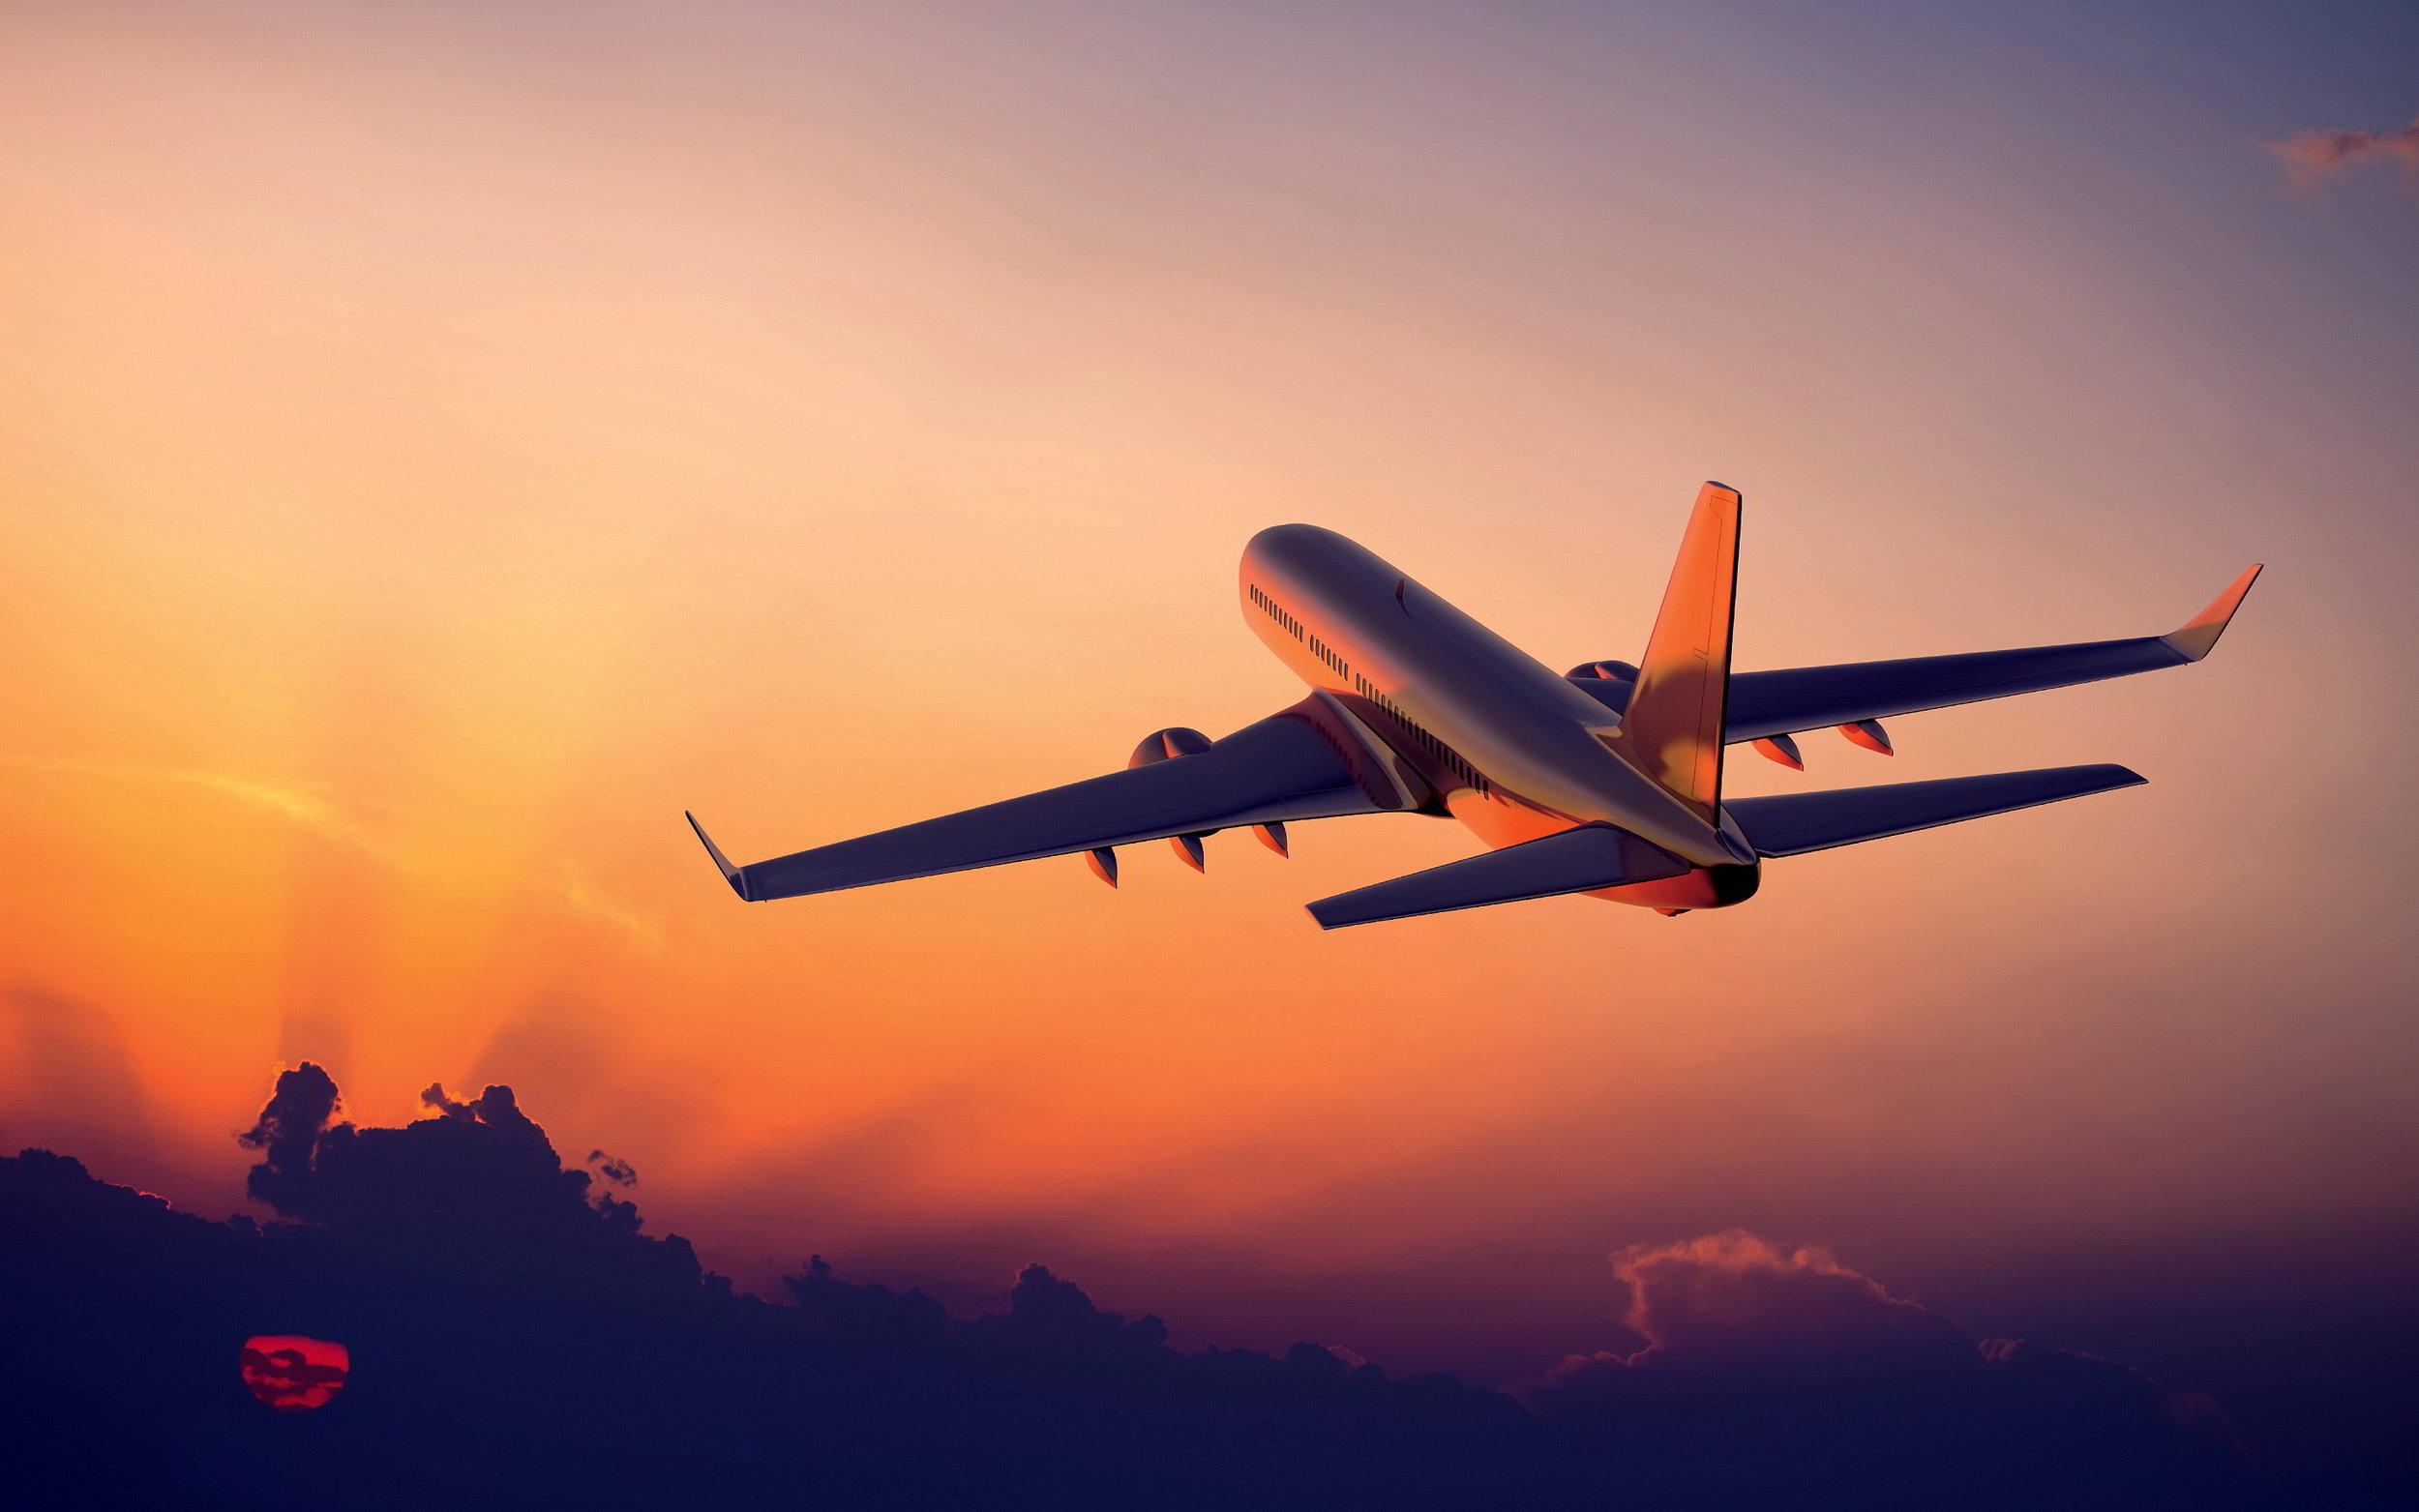 7014902-airplane-flight-sunset.jpg